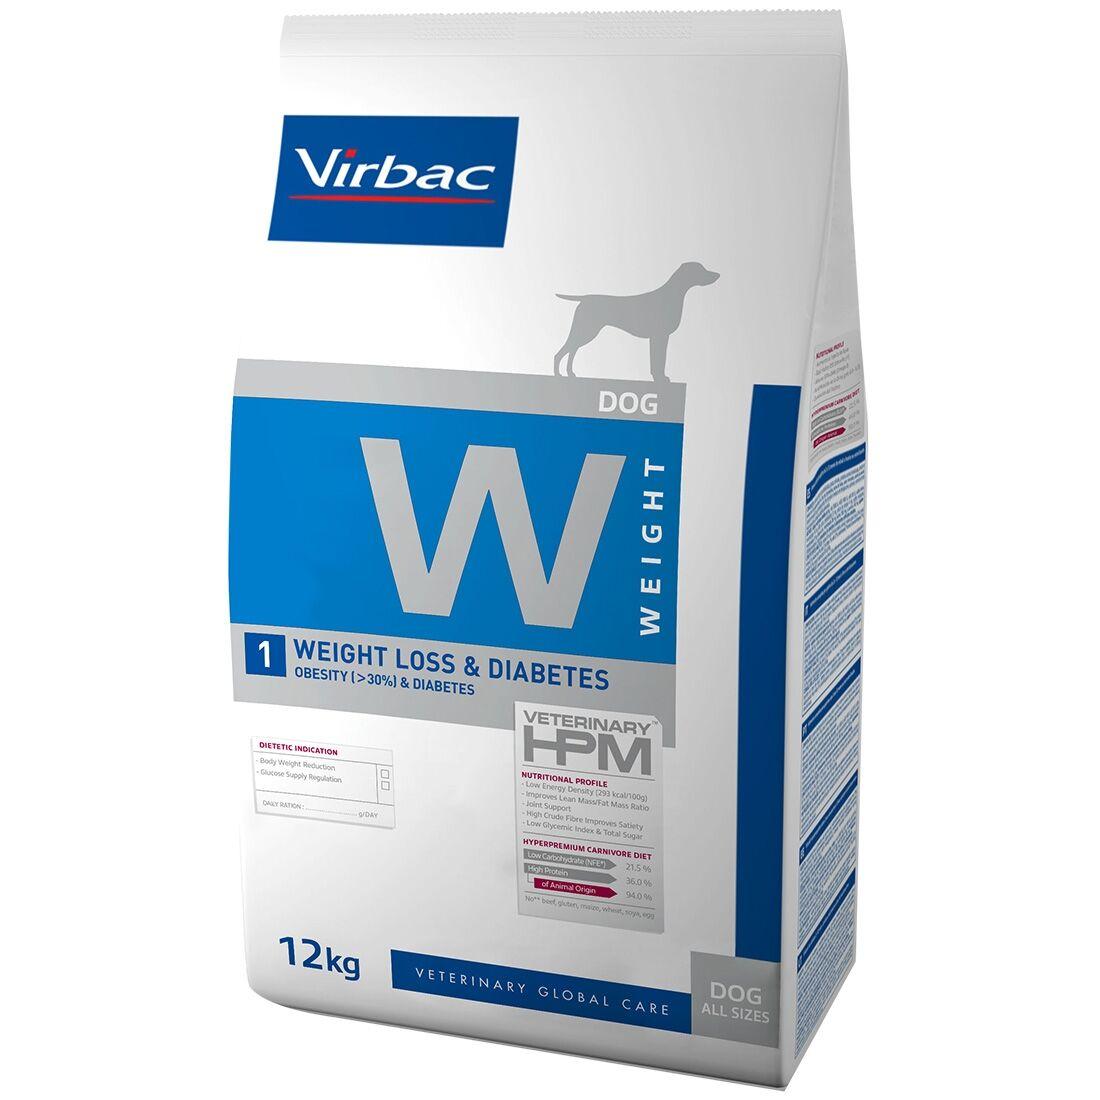 Virbac Veterinary HPM Weight Loss & Diabetes Dog Contenance : 3 kg